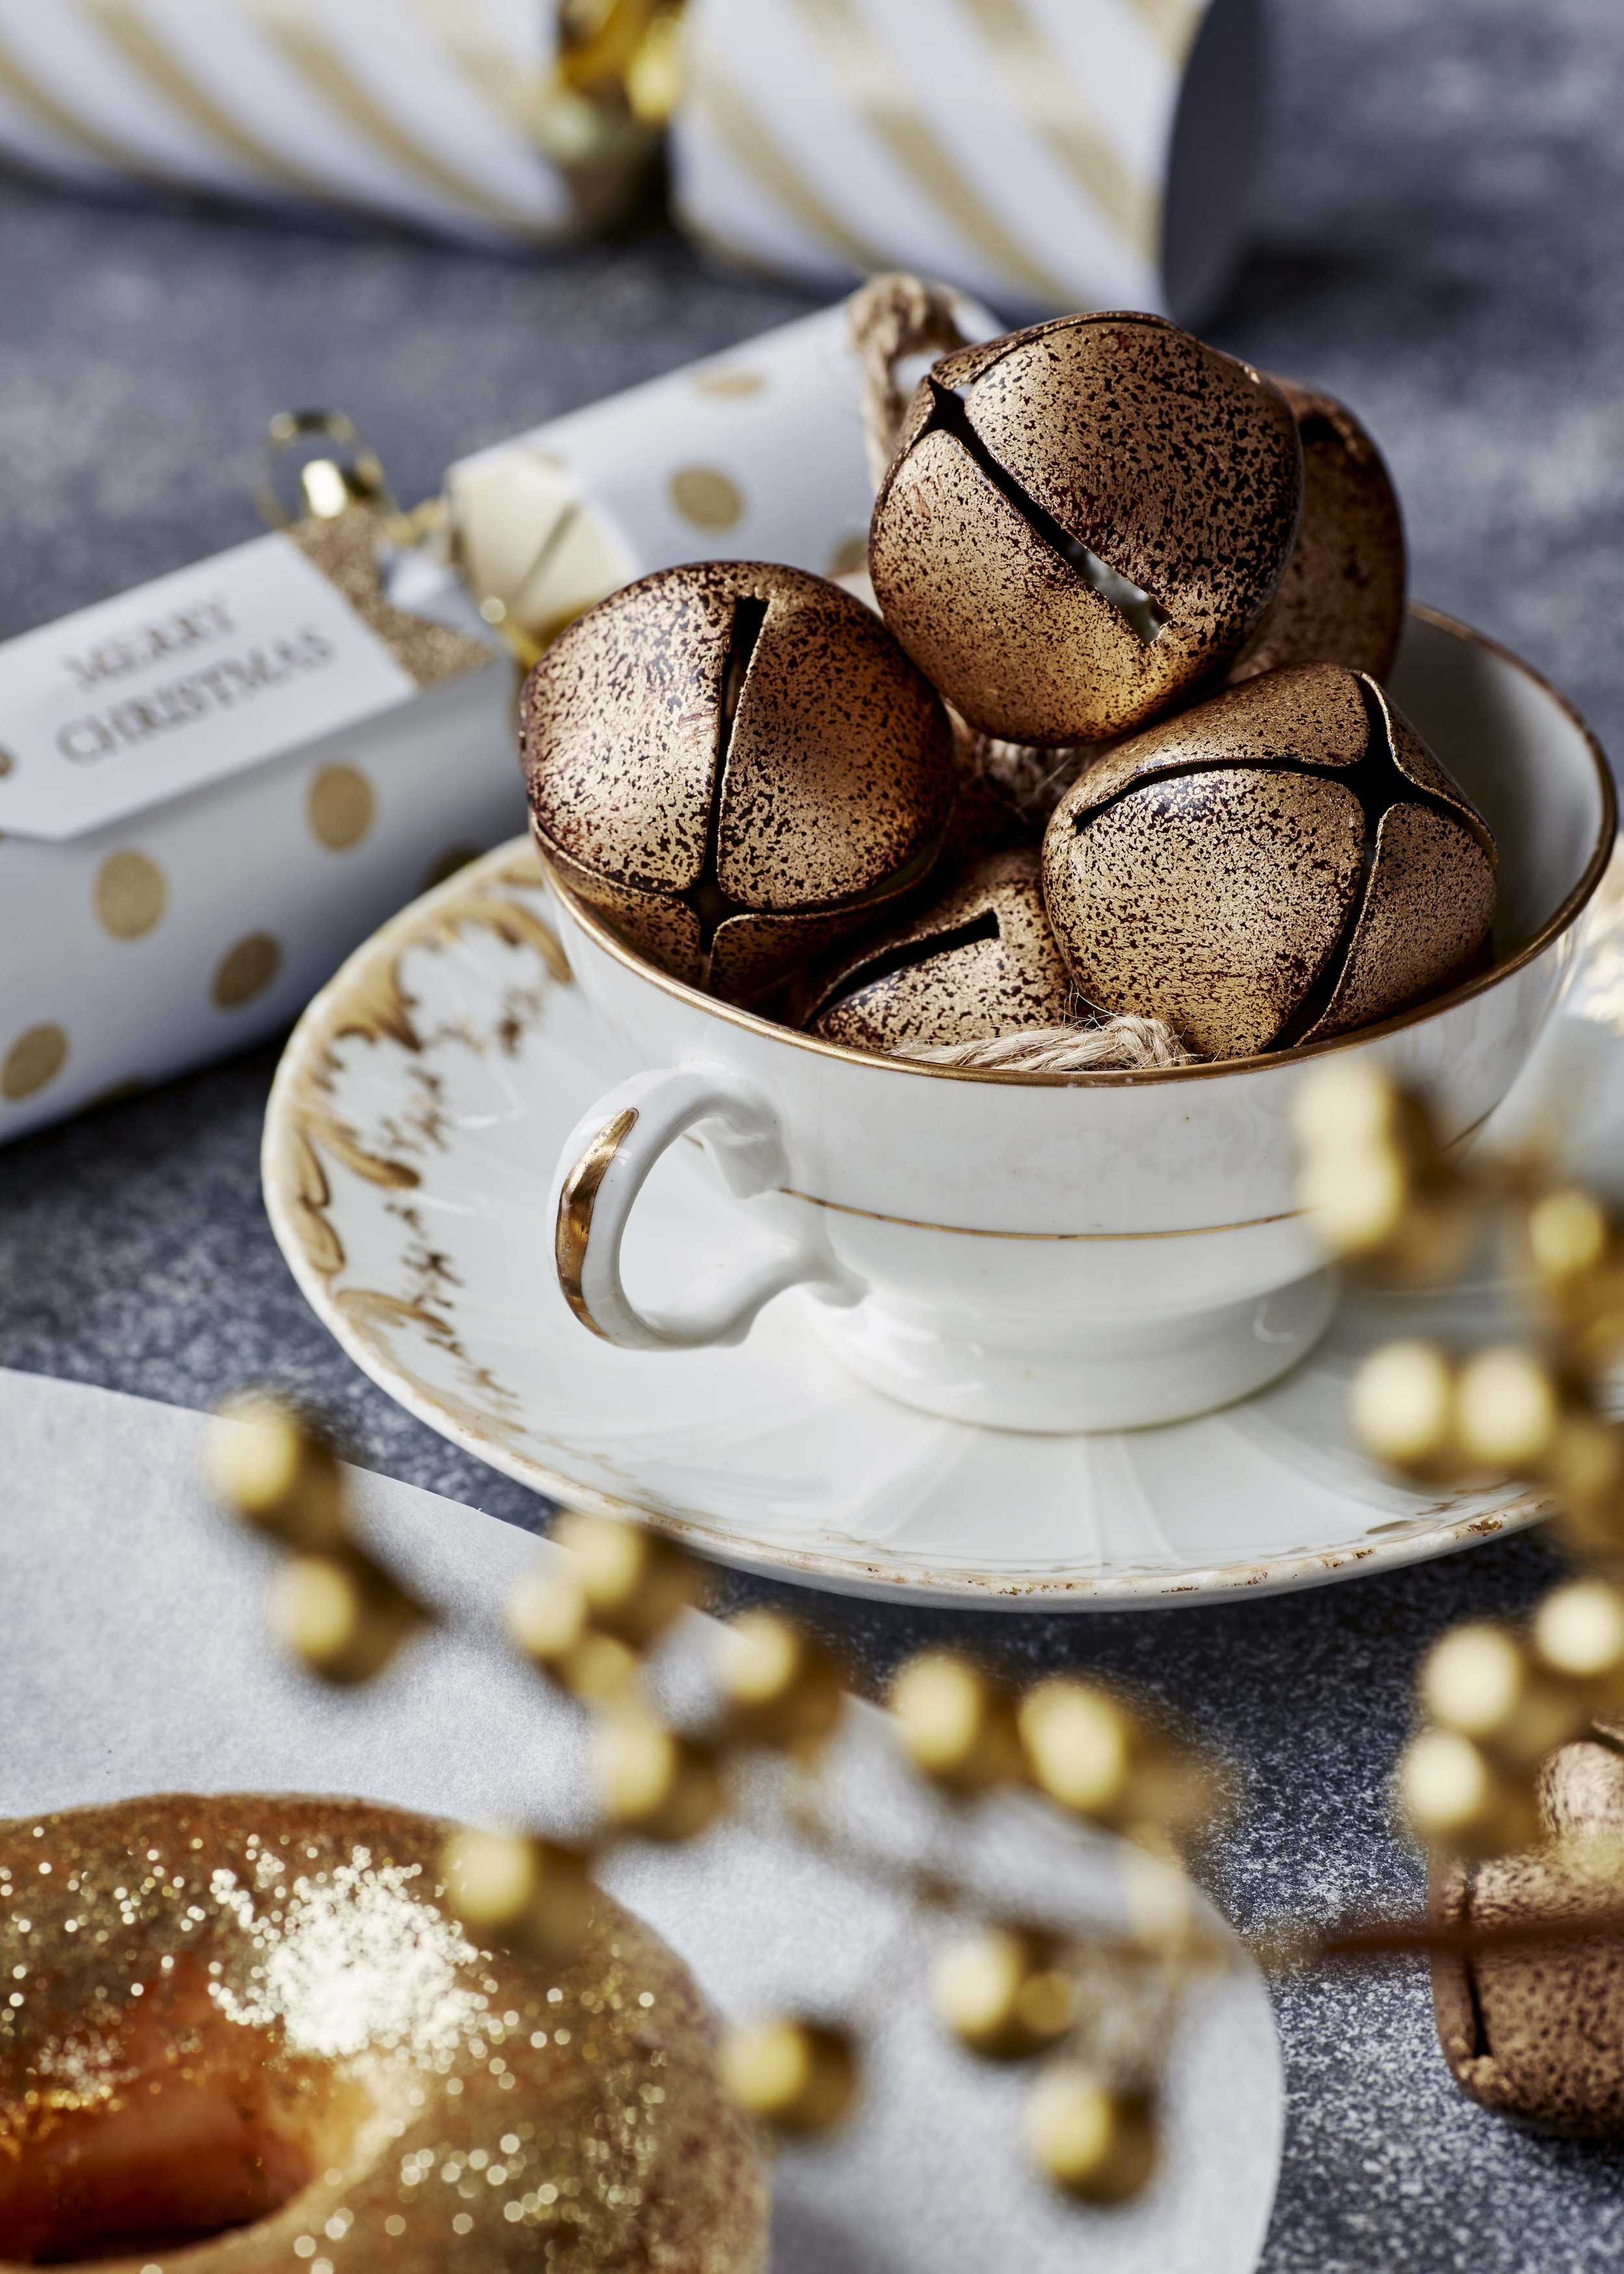 Liz_Cooper_Interior_Interiors_Still_LIfe_Props_Stylist_food_christmas.jpg